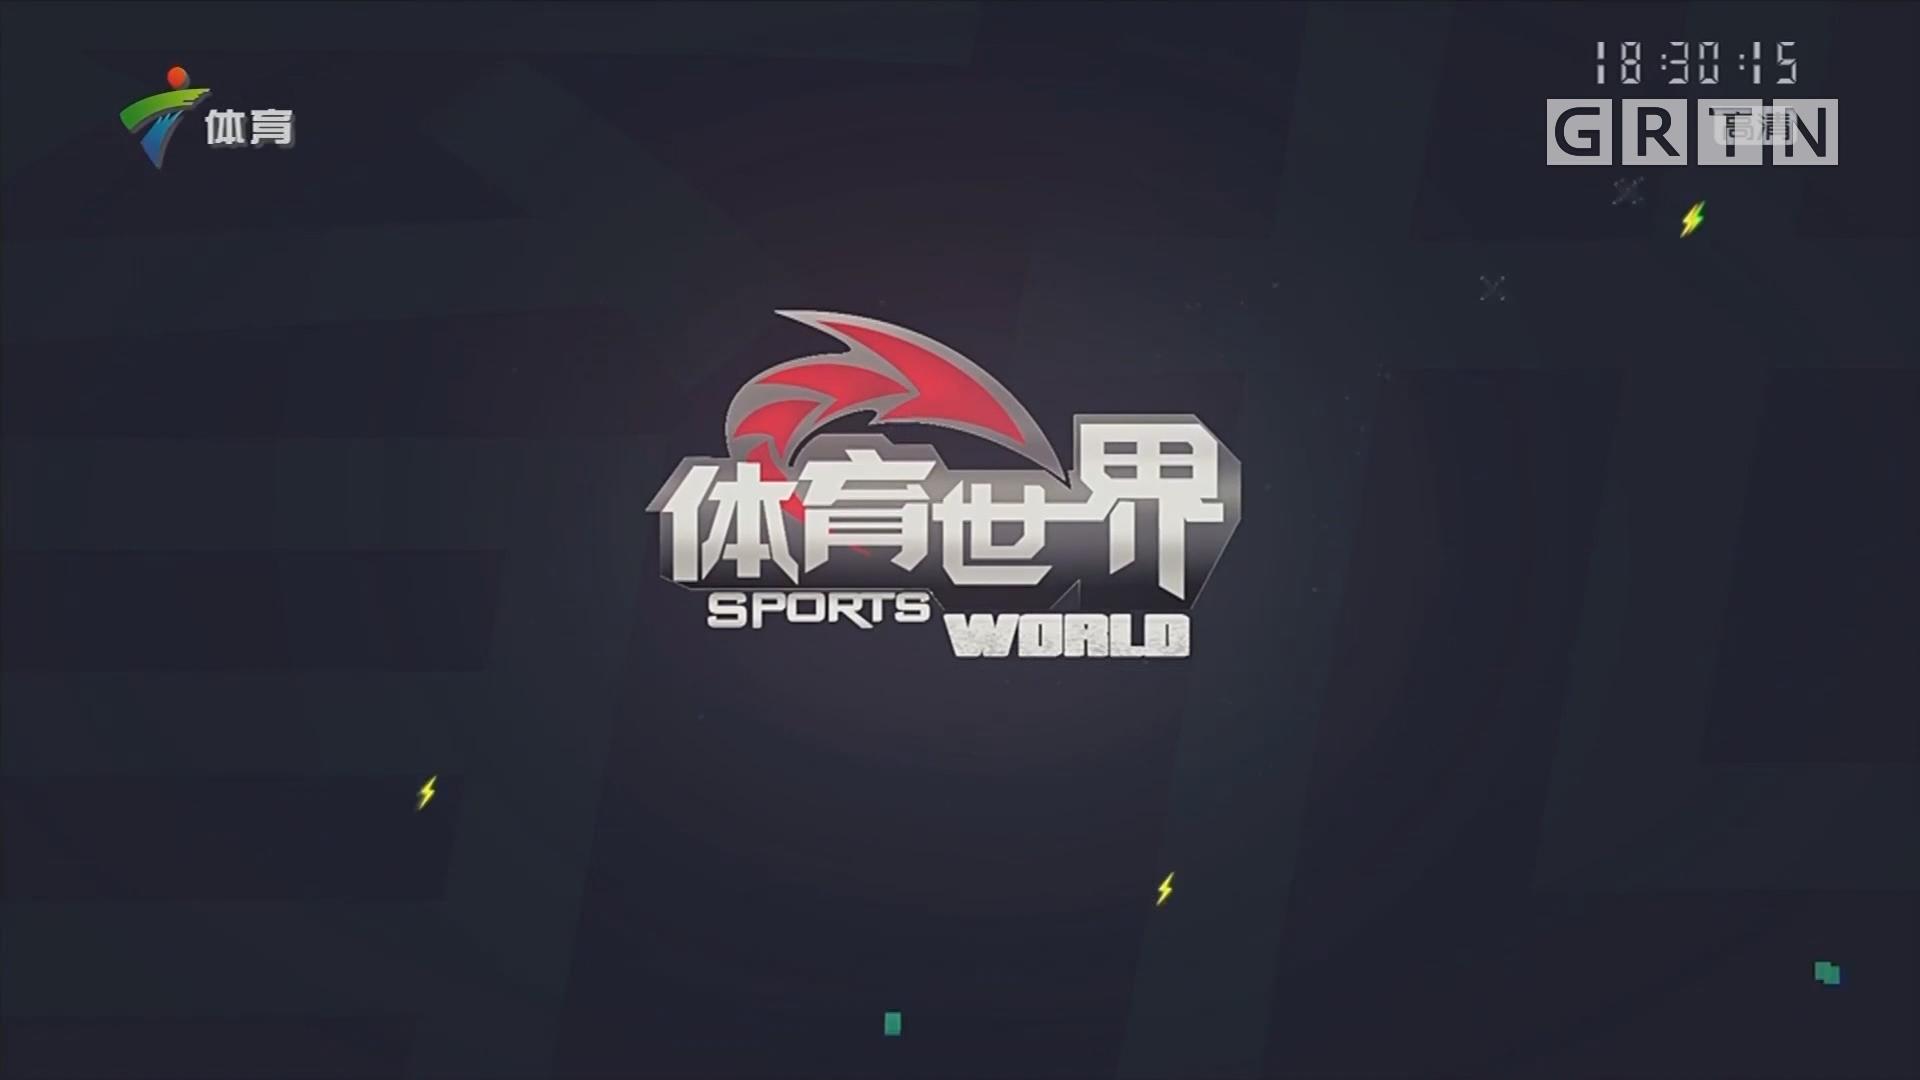 [HD][2019-04-01]体育世界:中办 国办印发《关于以2022年北京冬奥会为契机 大力发展冰雪运动的意见》